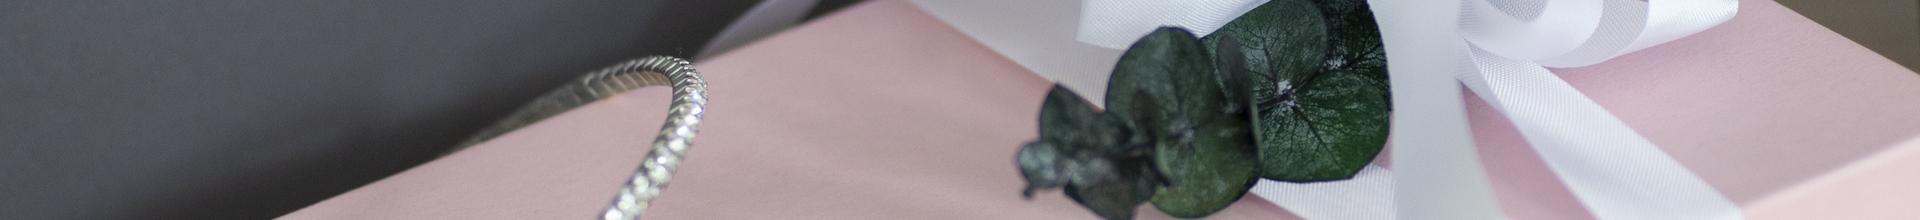 Kraft Pink Jewellery Gift Boxes